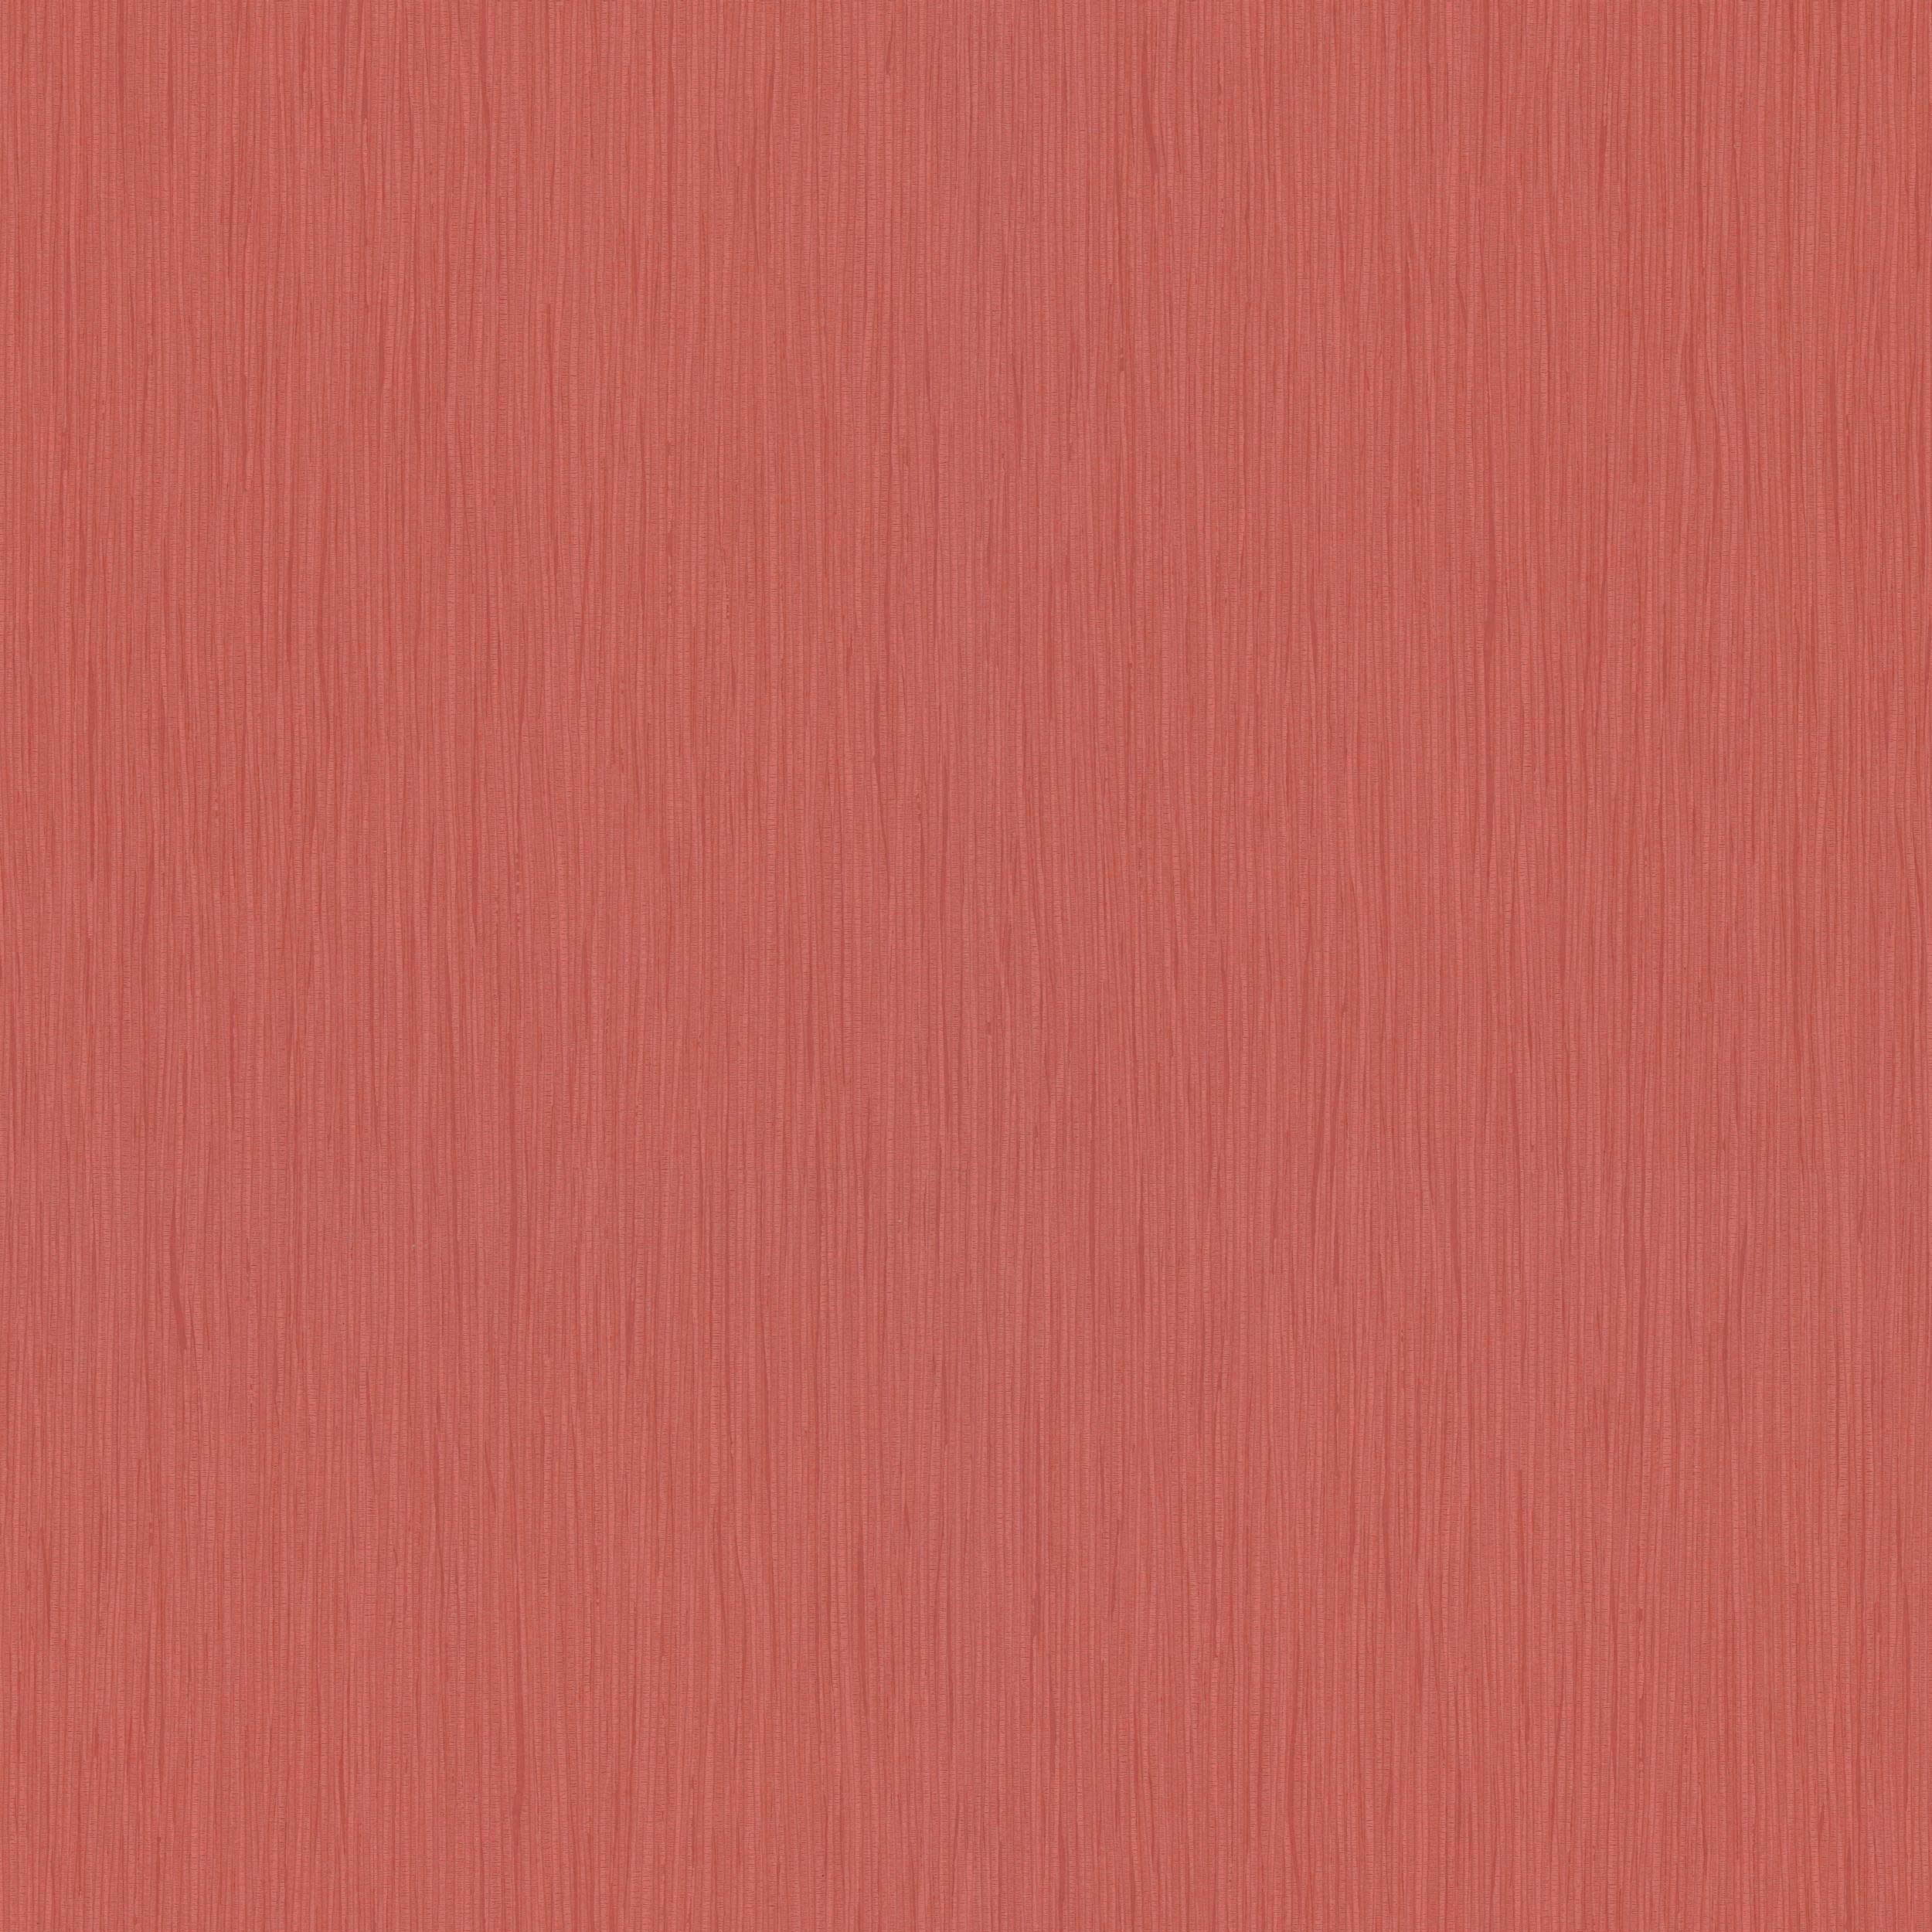 Binkele Farben, Lacke & Tapeten Onlinehandel - Marburg KUNTERBUNT 56520